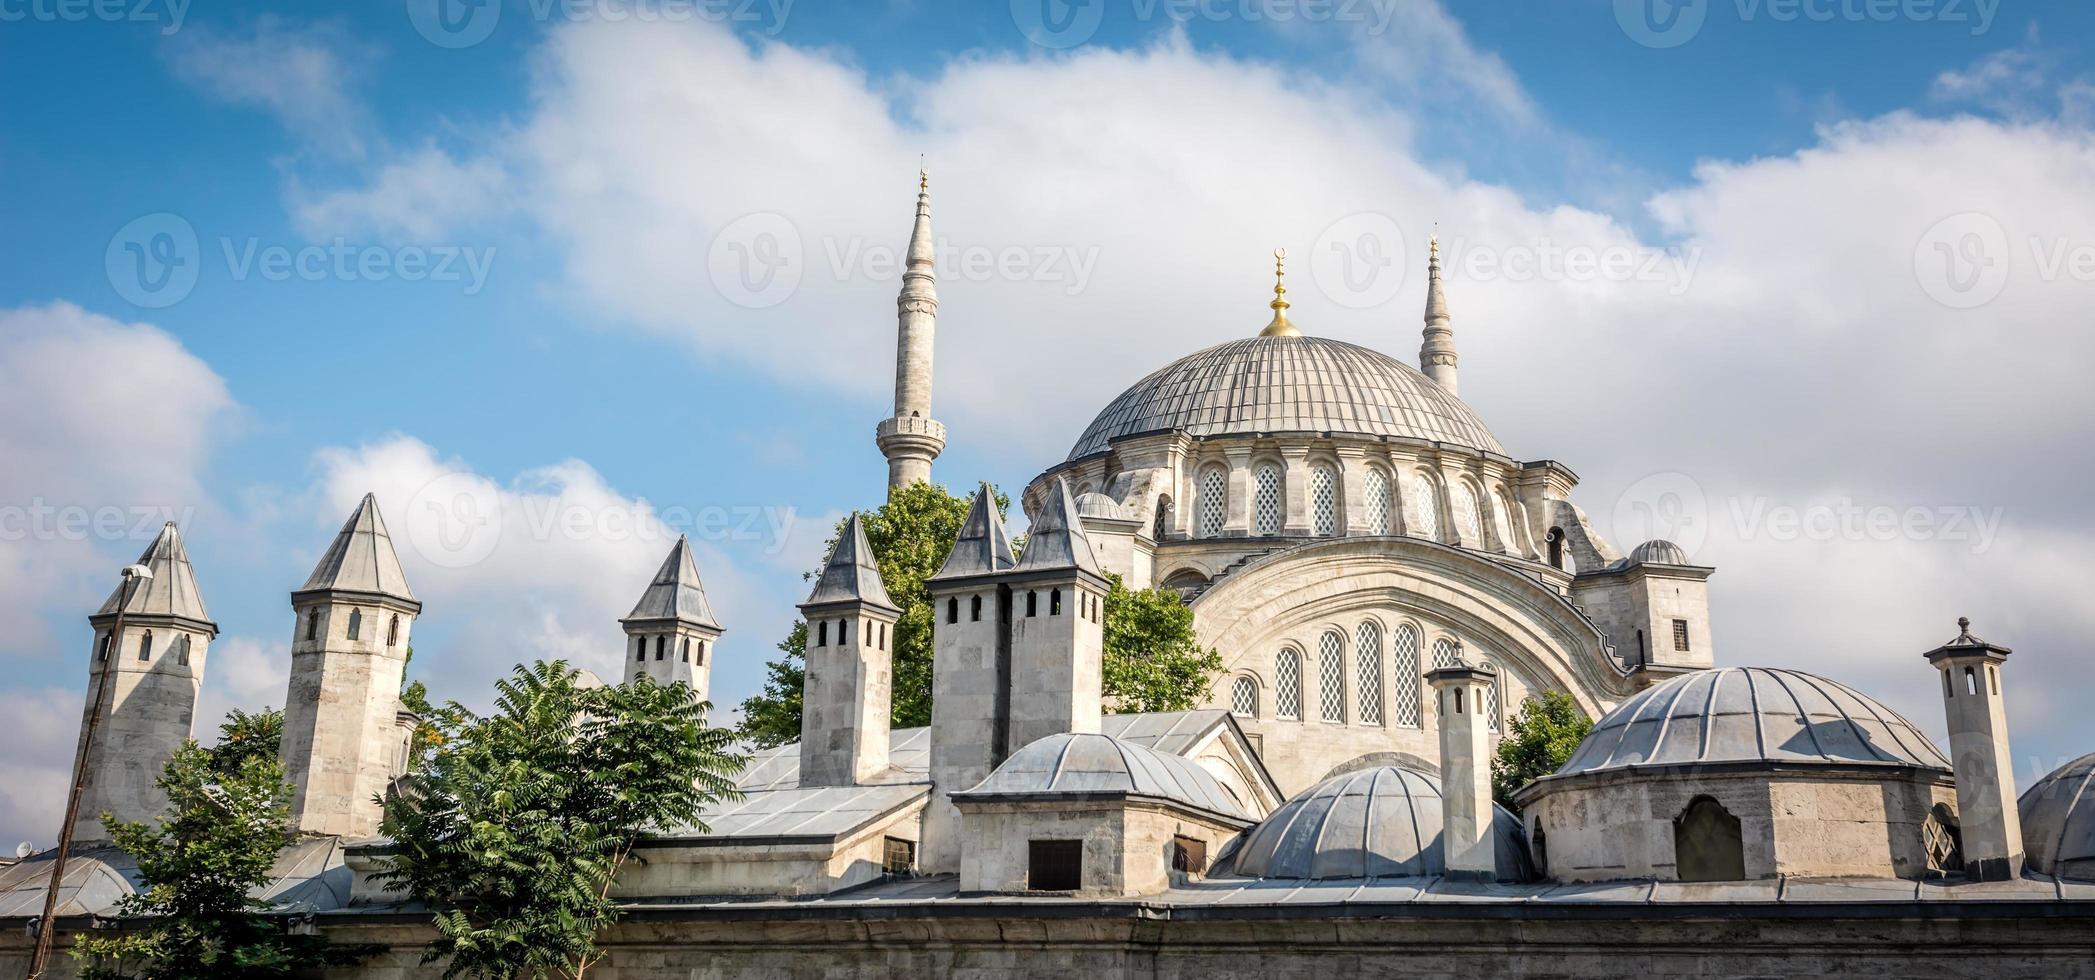 Nuruosmaniye Moschee in Istanbul, Türkei foto